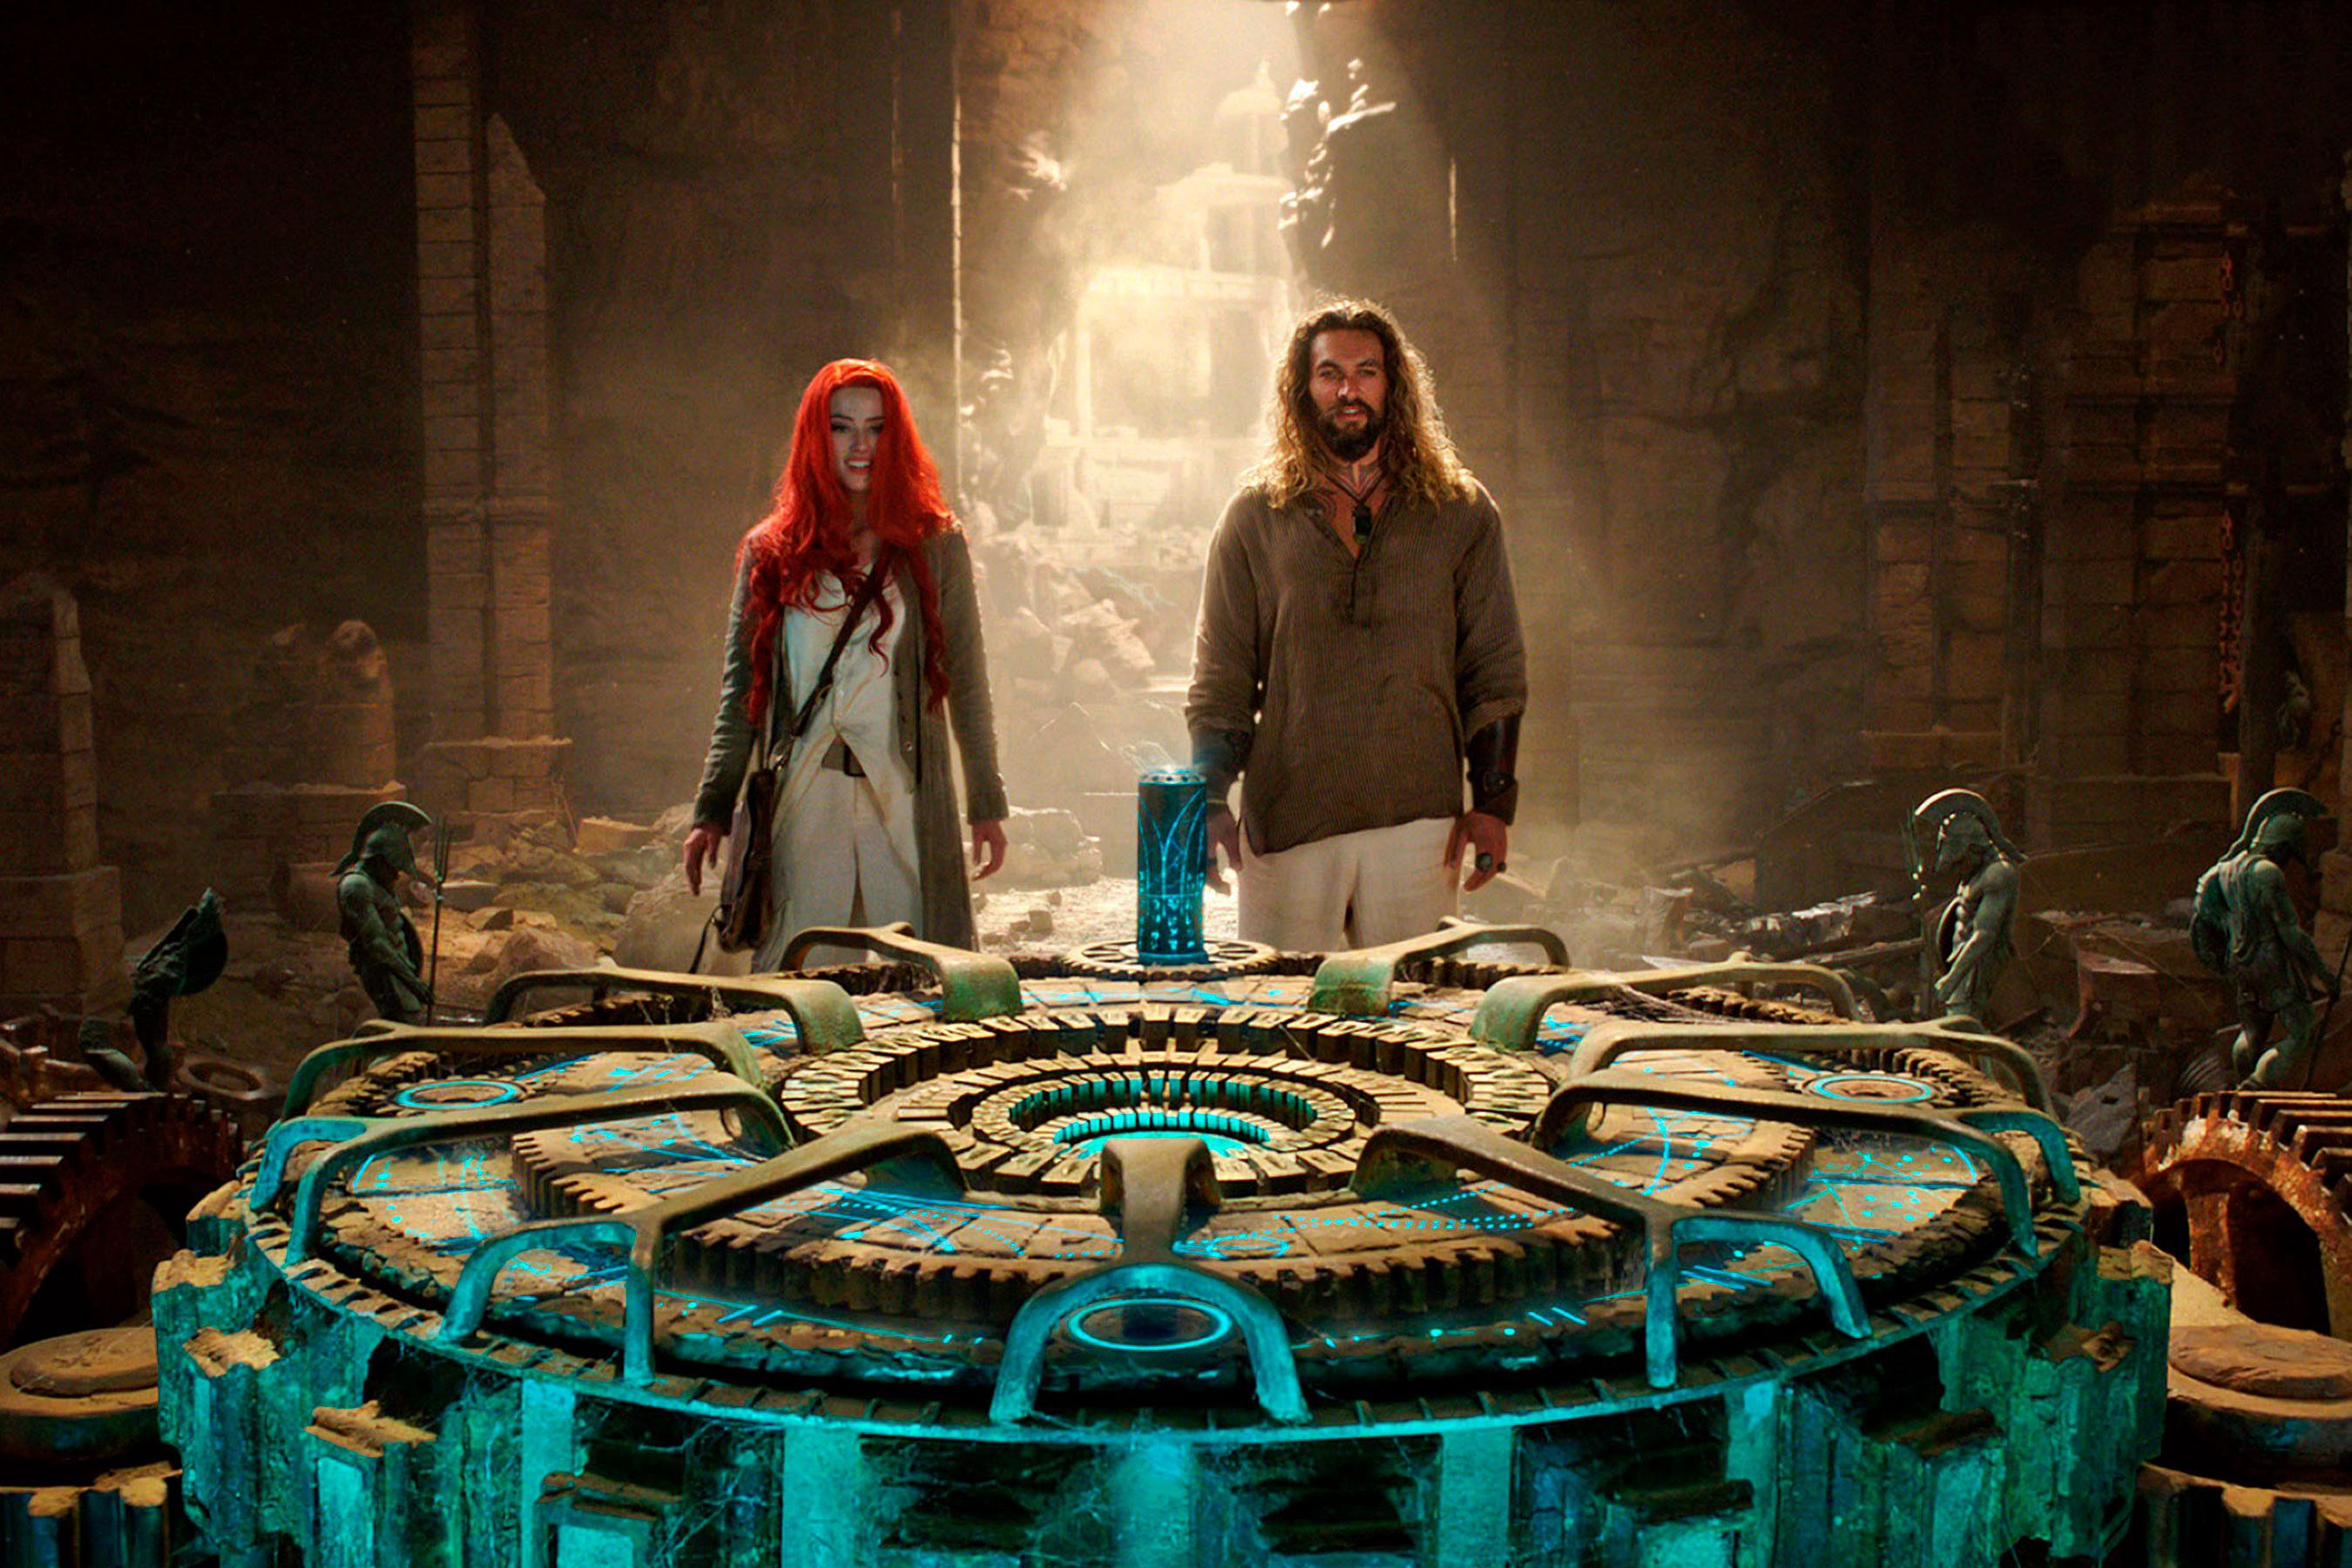 Movie Aquaman And Mera Still 2018 HD Wallpapers 2700x1800